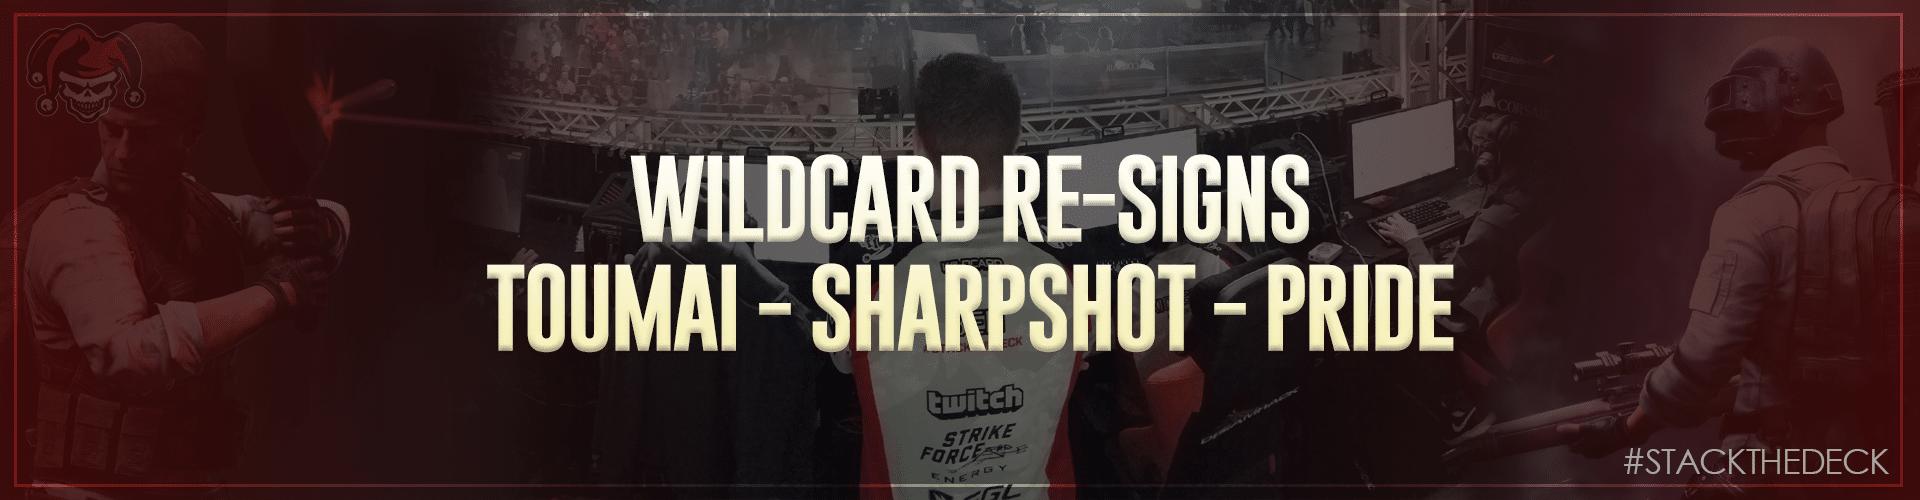 Wildcard Re-Signs PUBG Team!